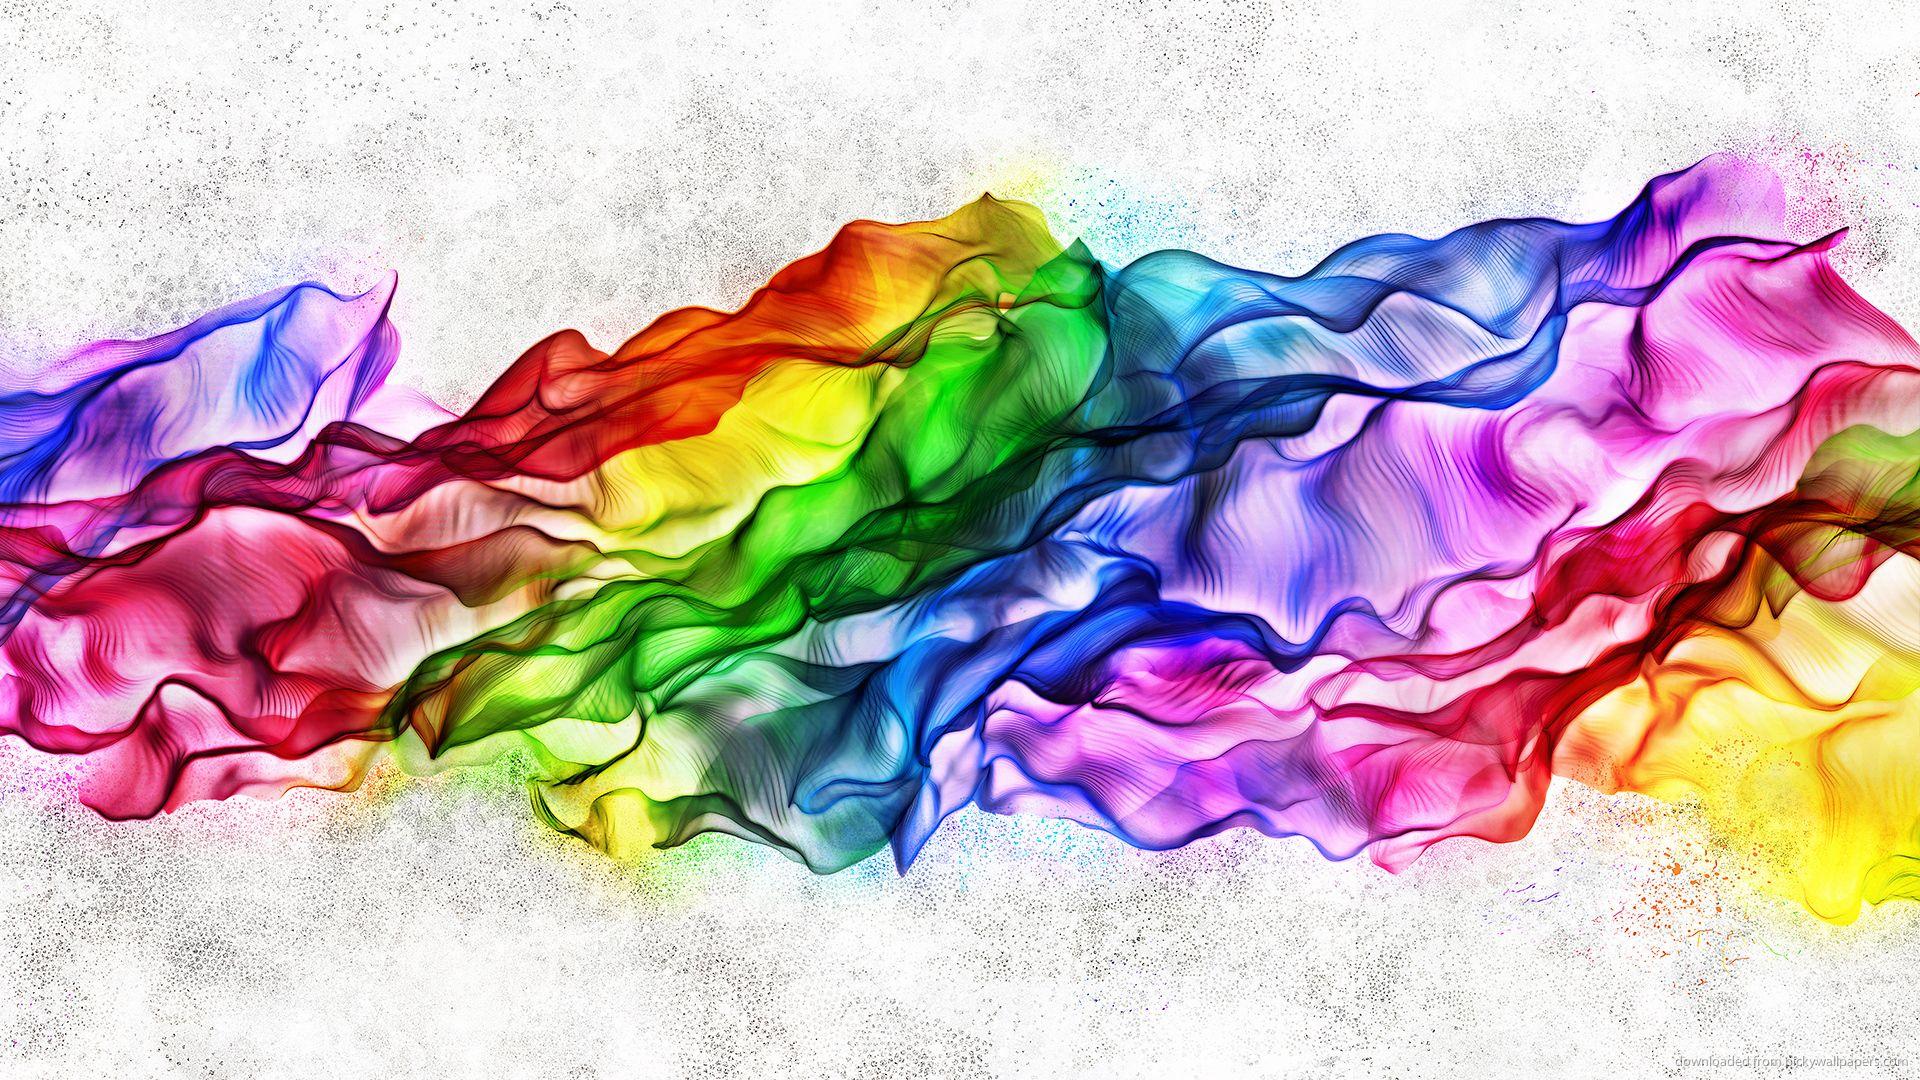 Cool Wallpaper High Resolution Rainbow - fdff60fc3ef28fc4f7233ebdf02357ee  Photograph_113558.jpg